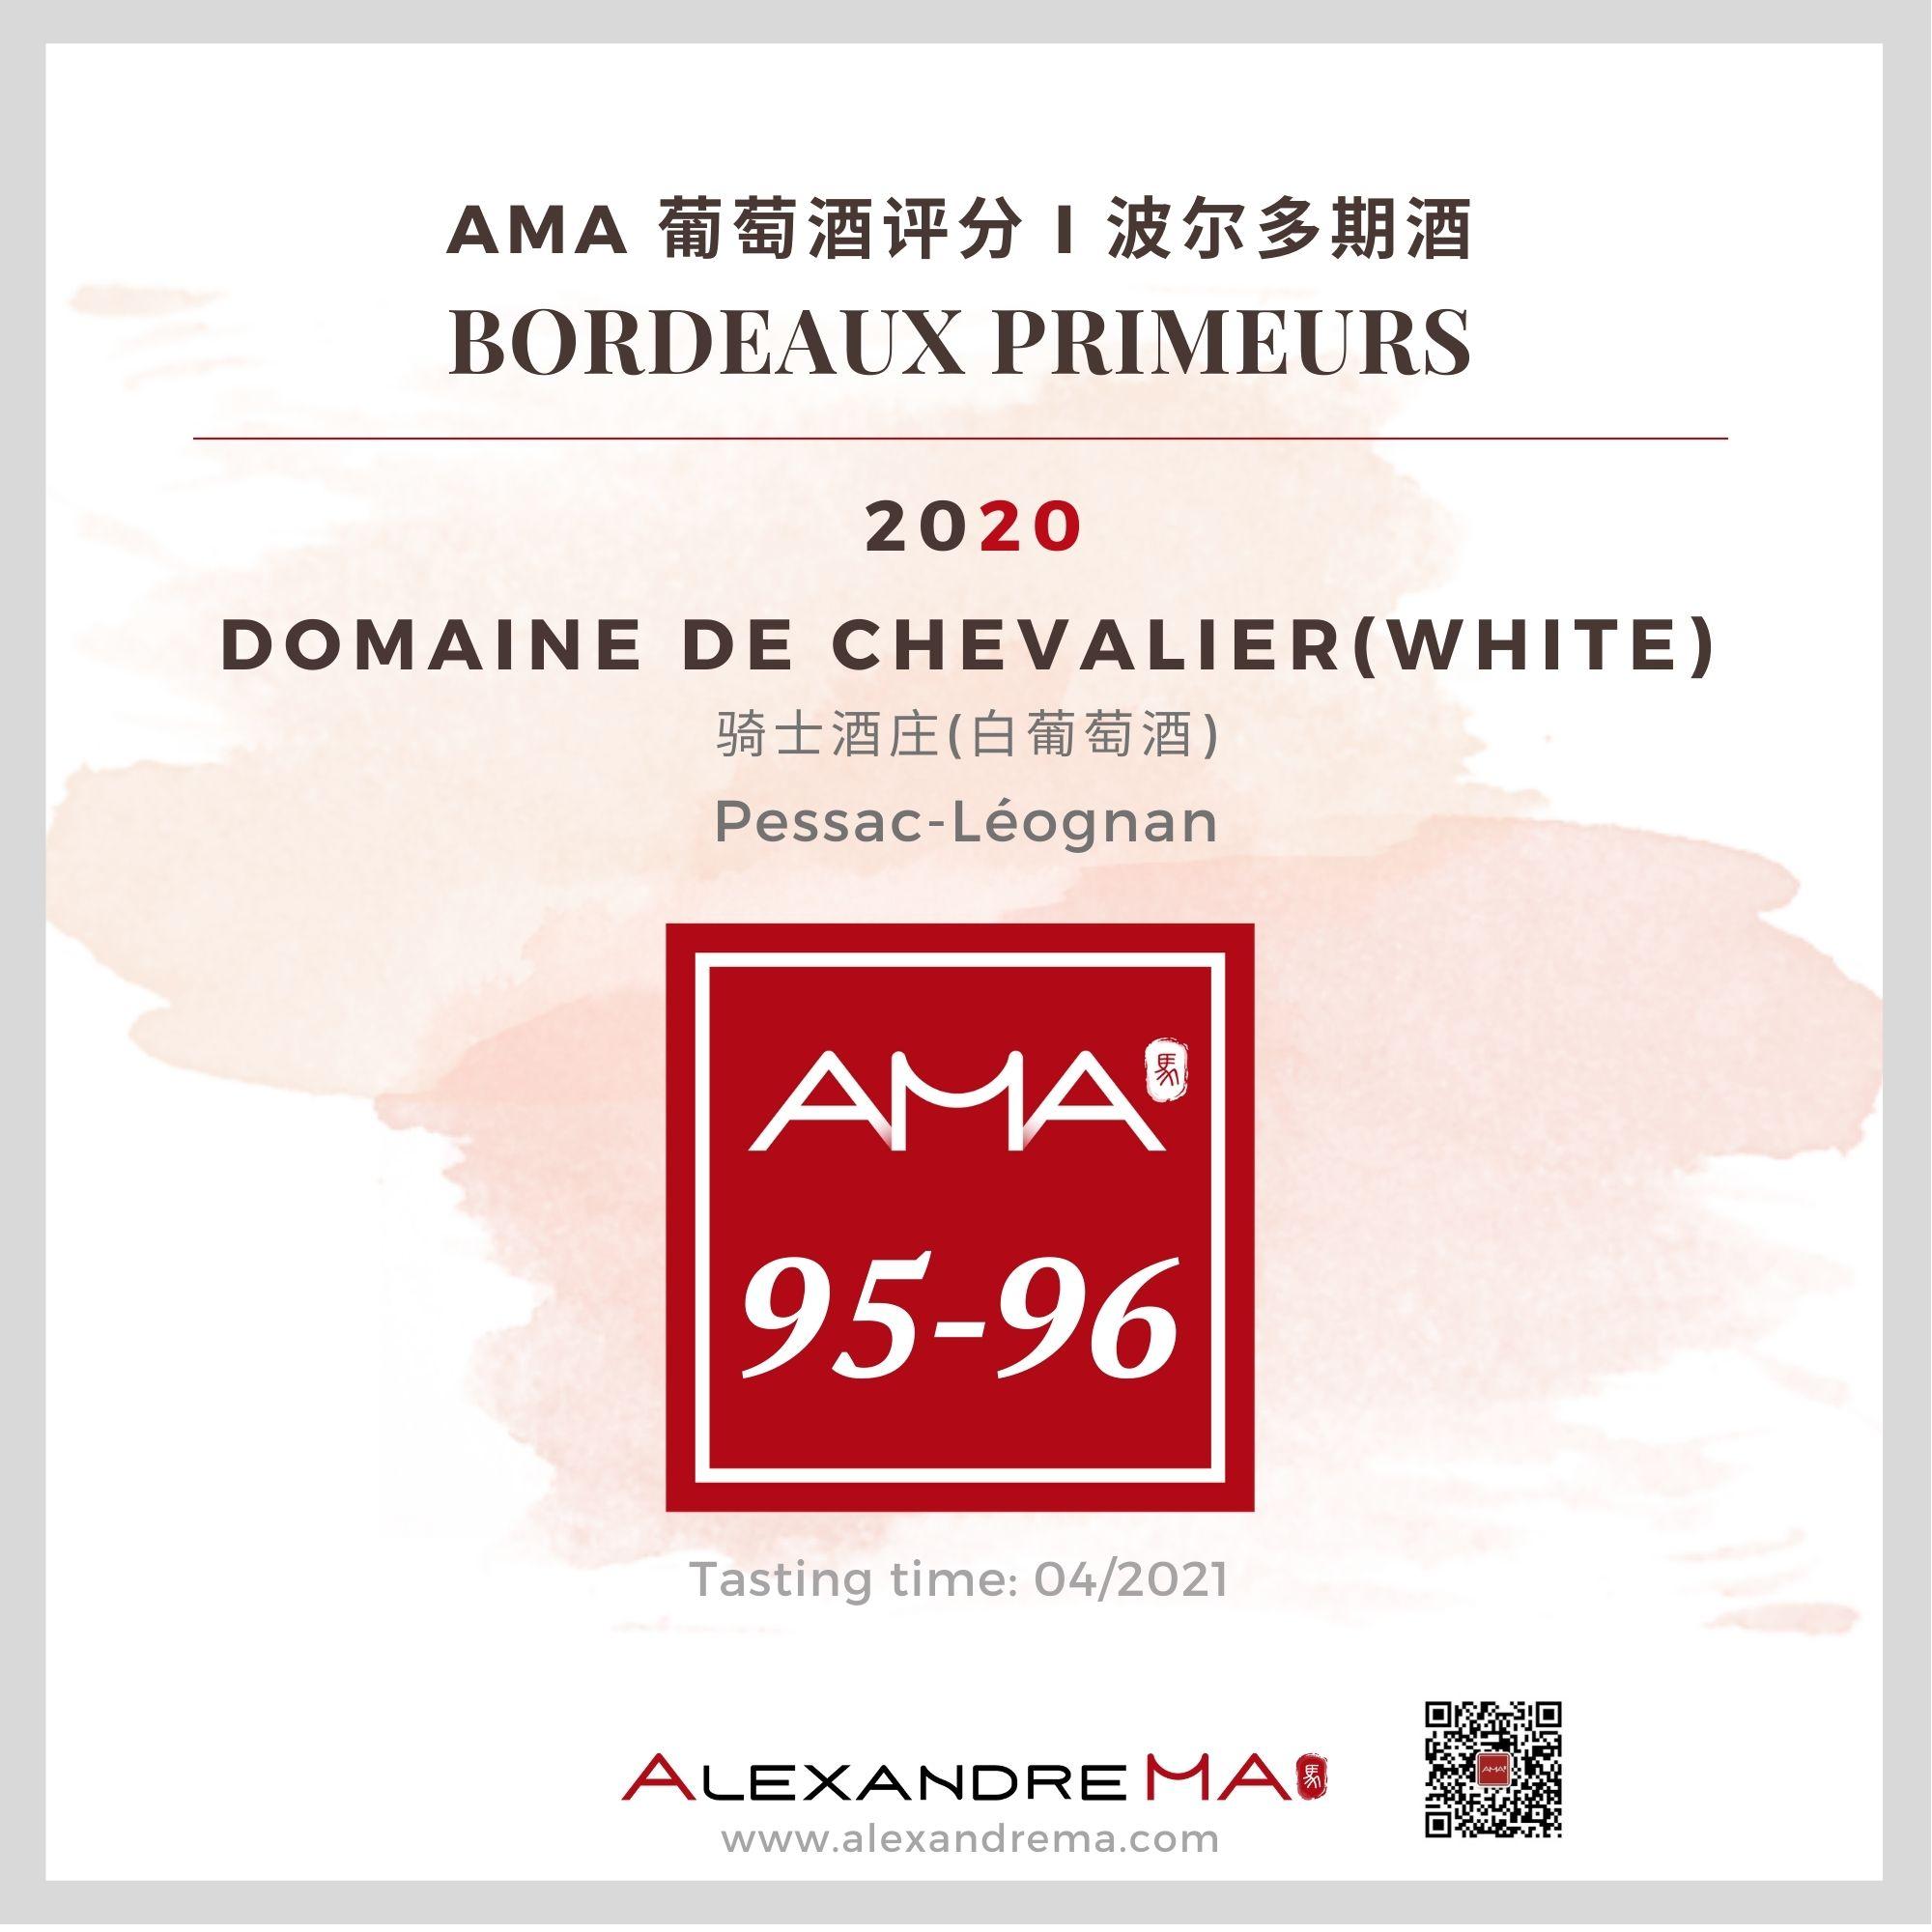 Domaine de Chevalier White 2020 骑士酒庄 - Alexandre Ma